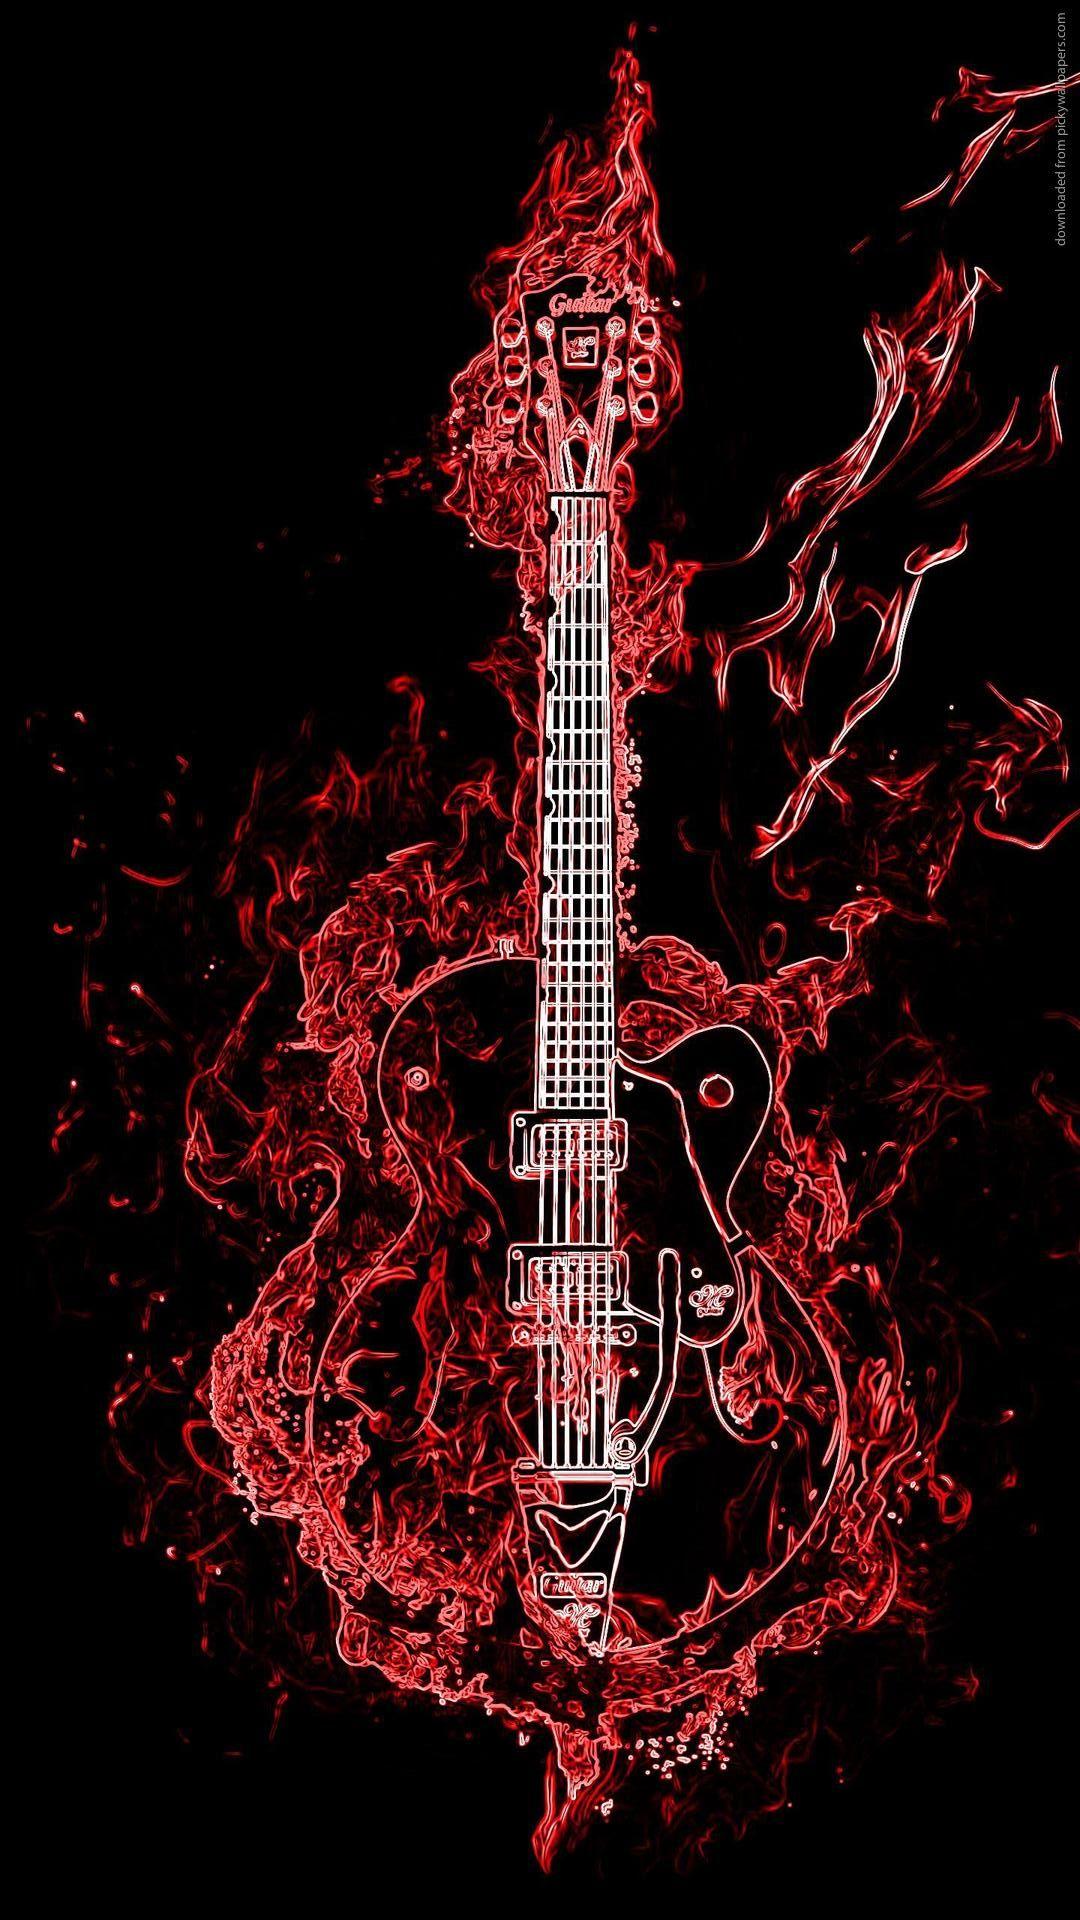 Neon Guitar Wallpaper iPhone Fond d'écran iphone